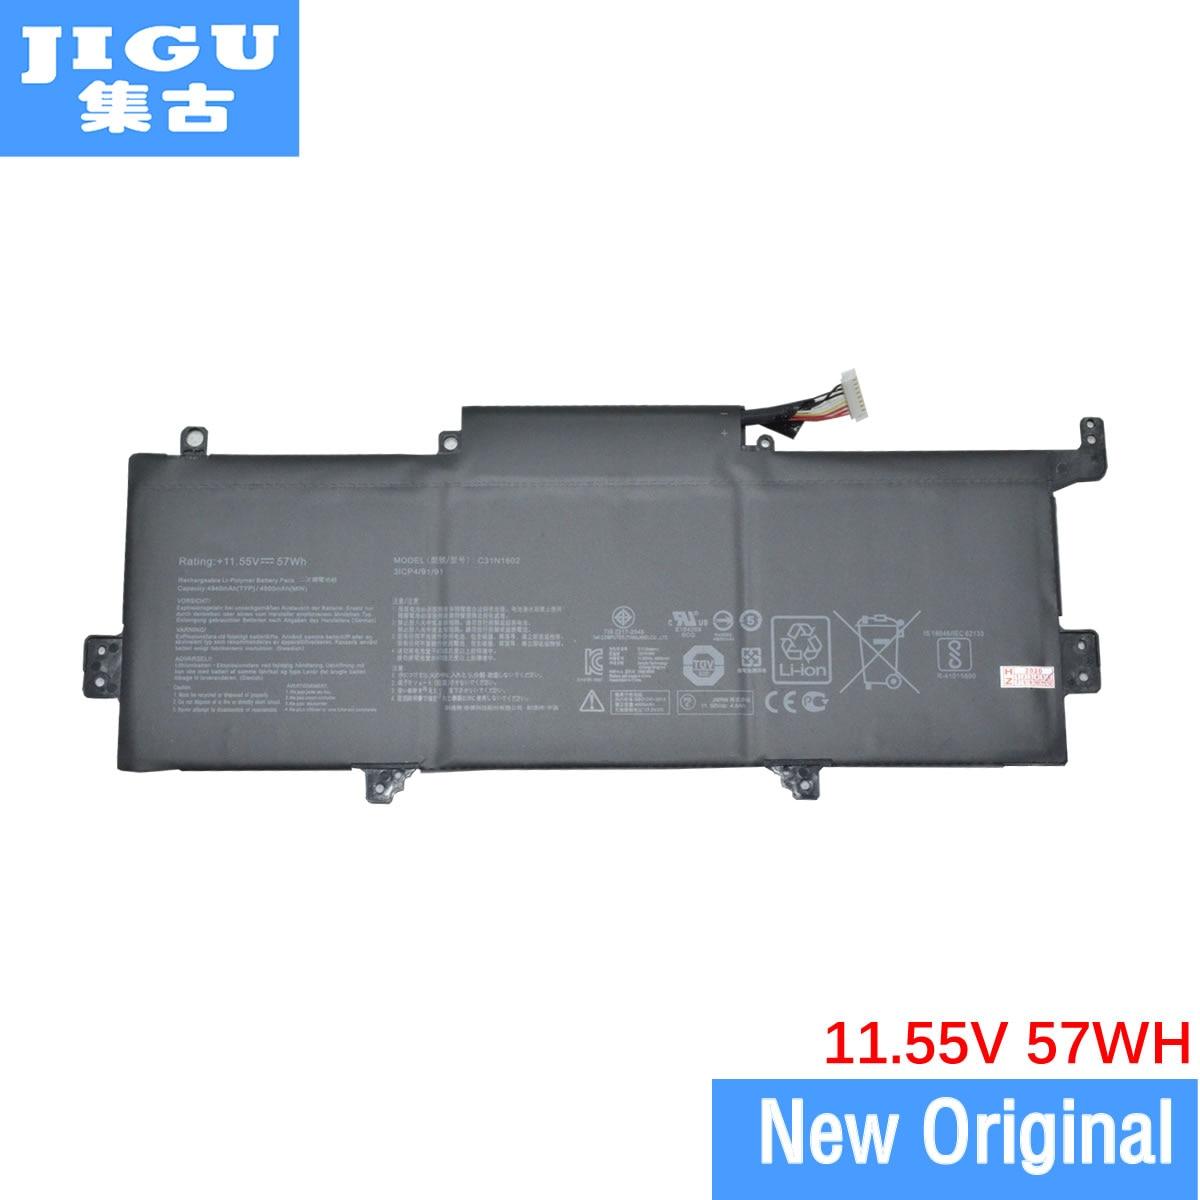 Batería Original para portátil JIGU C31N1602 0B200-02090000 para ASUS UX330UA UX330UAK para Zenbook UX330UA